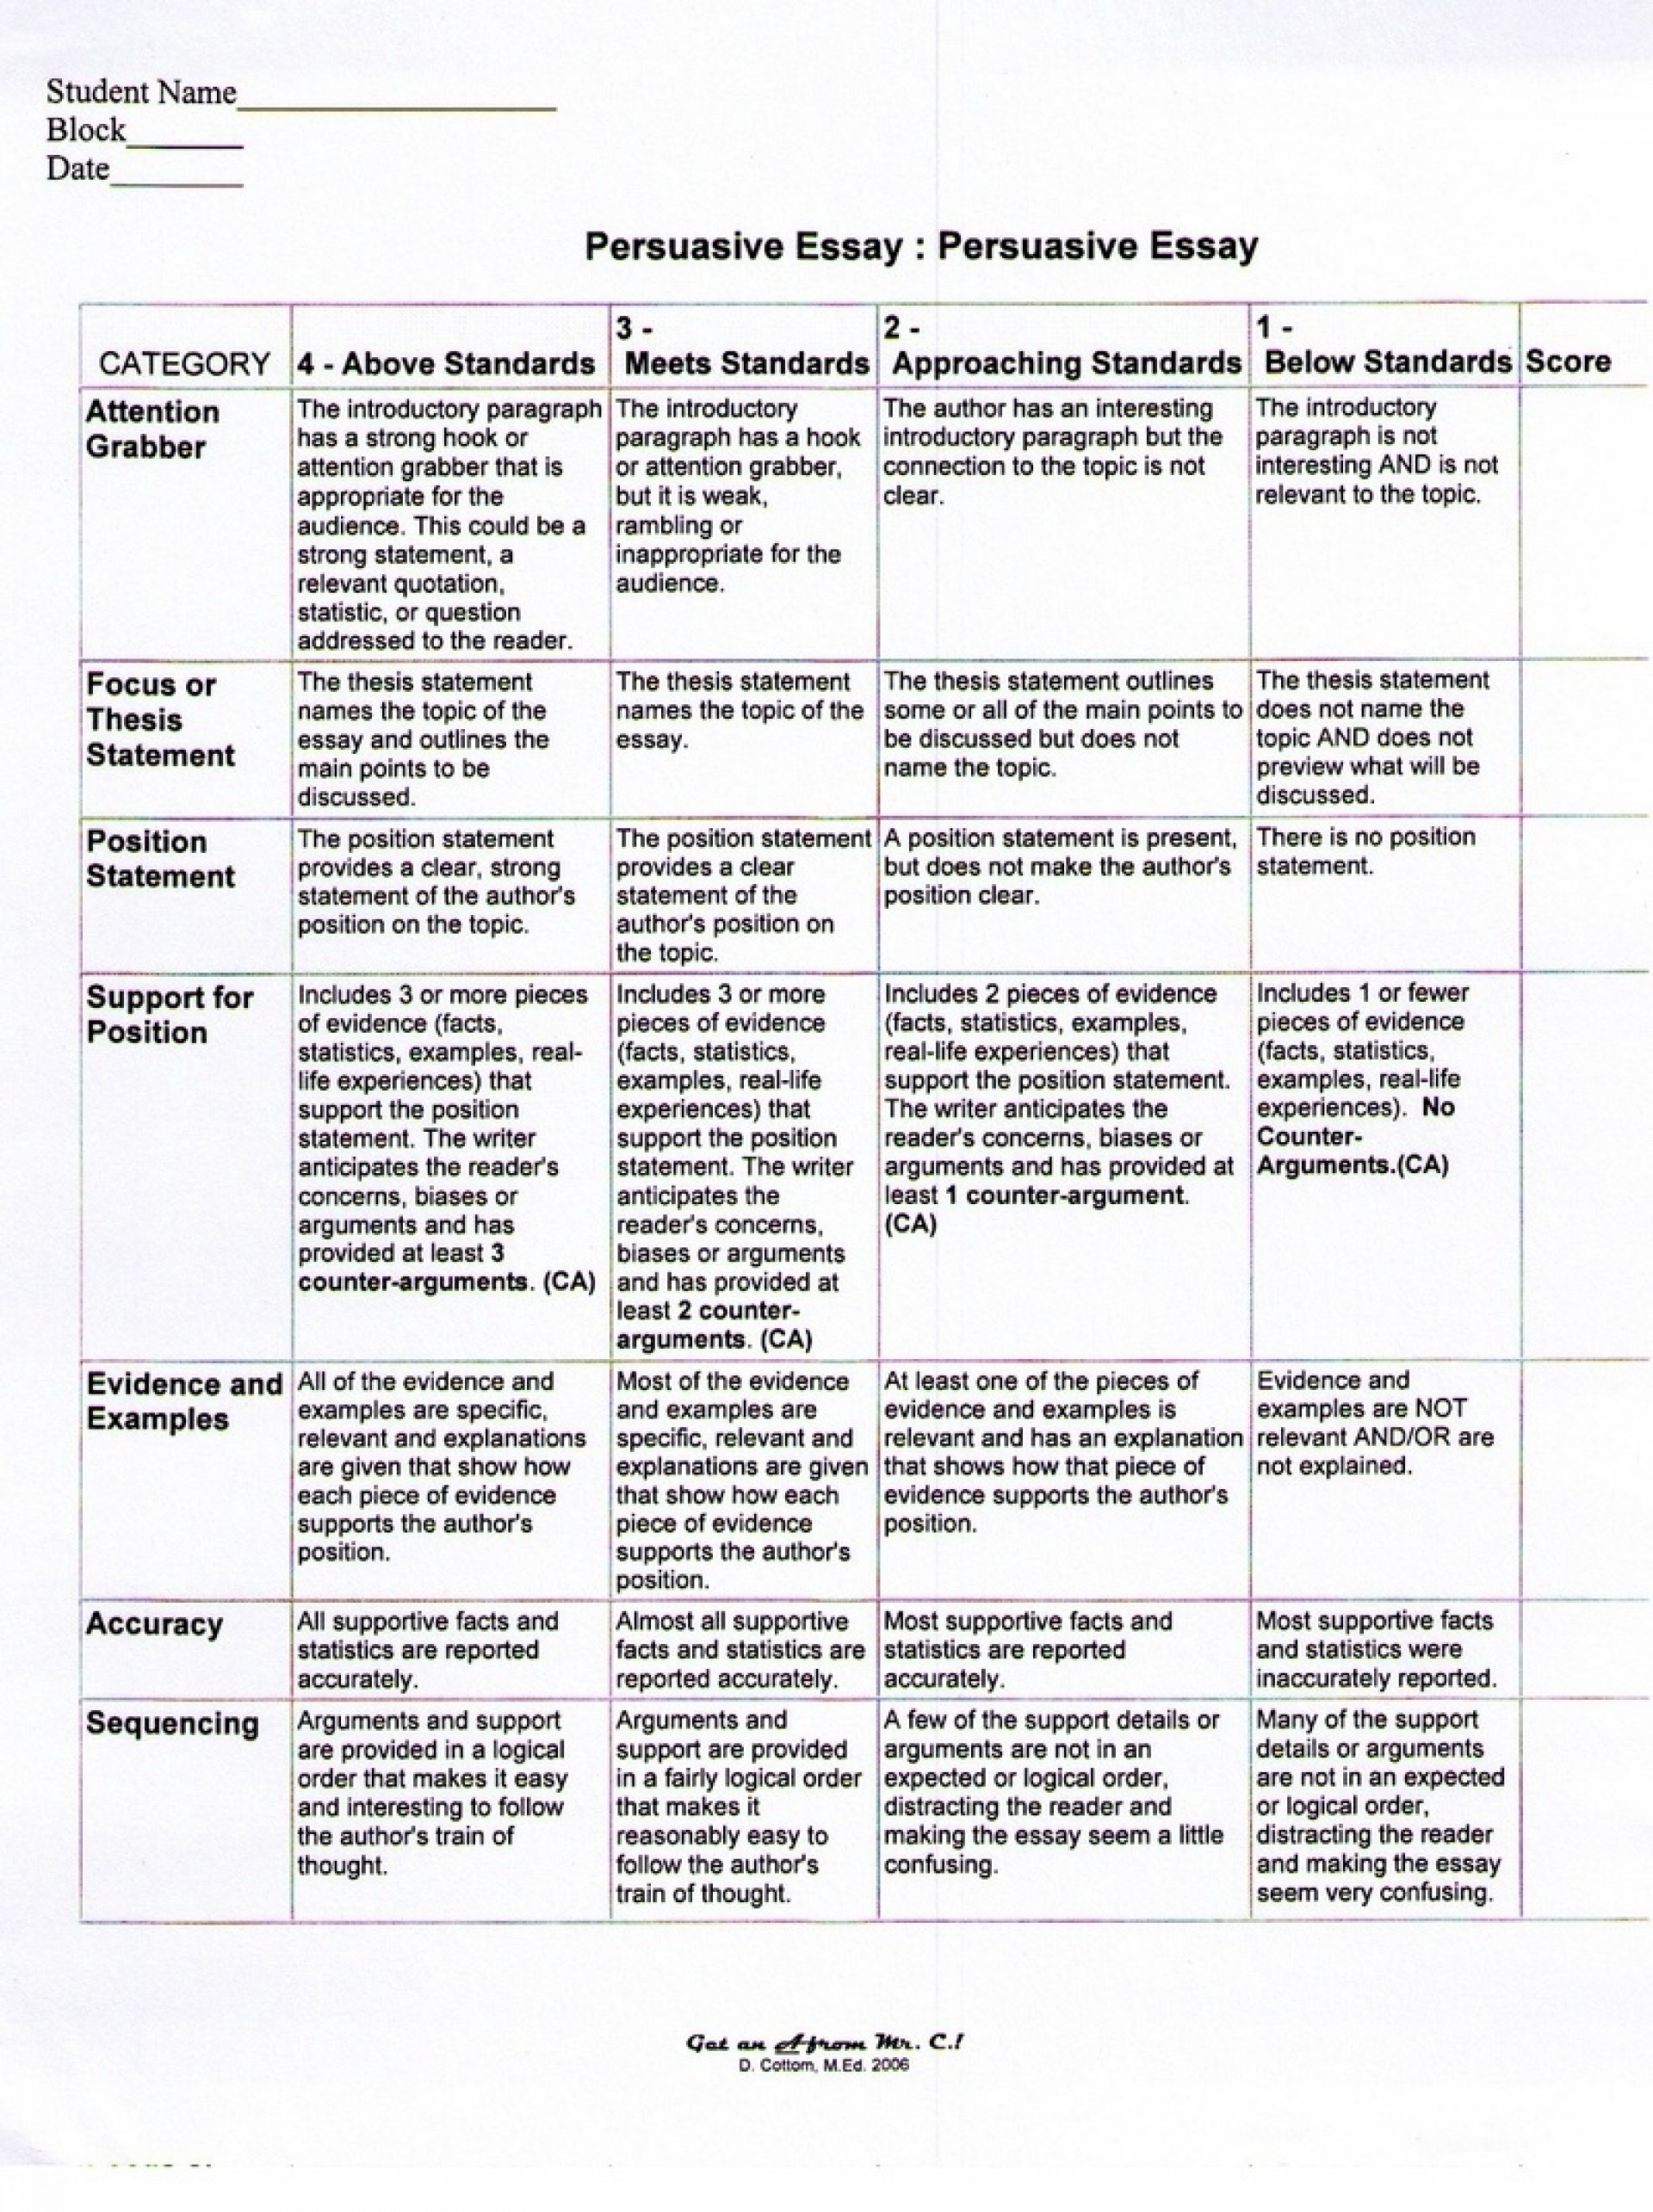 019 Persuasive20essay20rubric20pg1 Persuasive Essay Topics For Middle School Imposing Prompts Argumentative High Pdf 1920